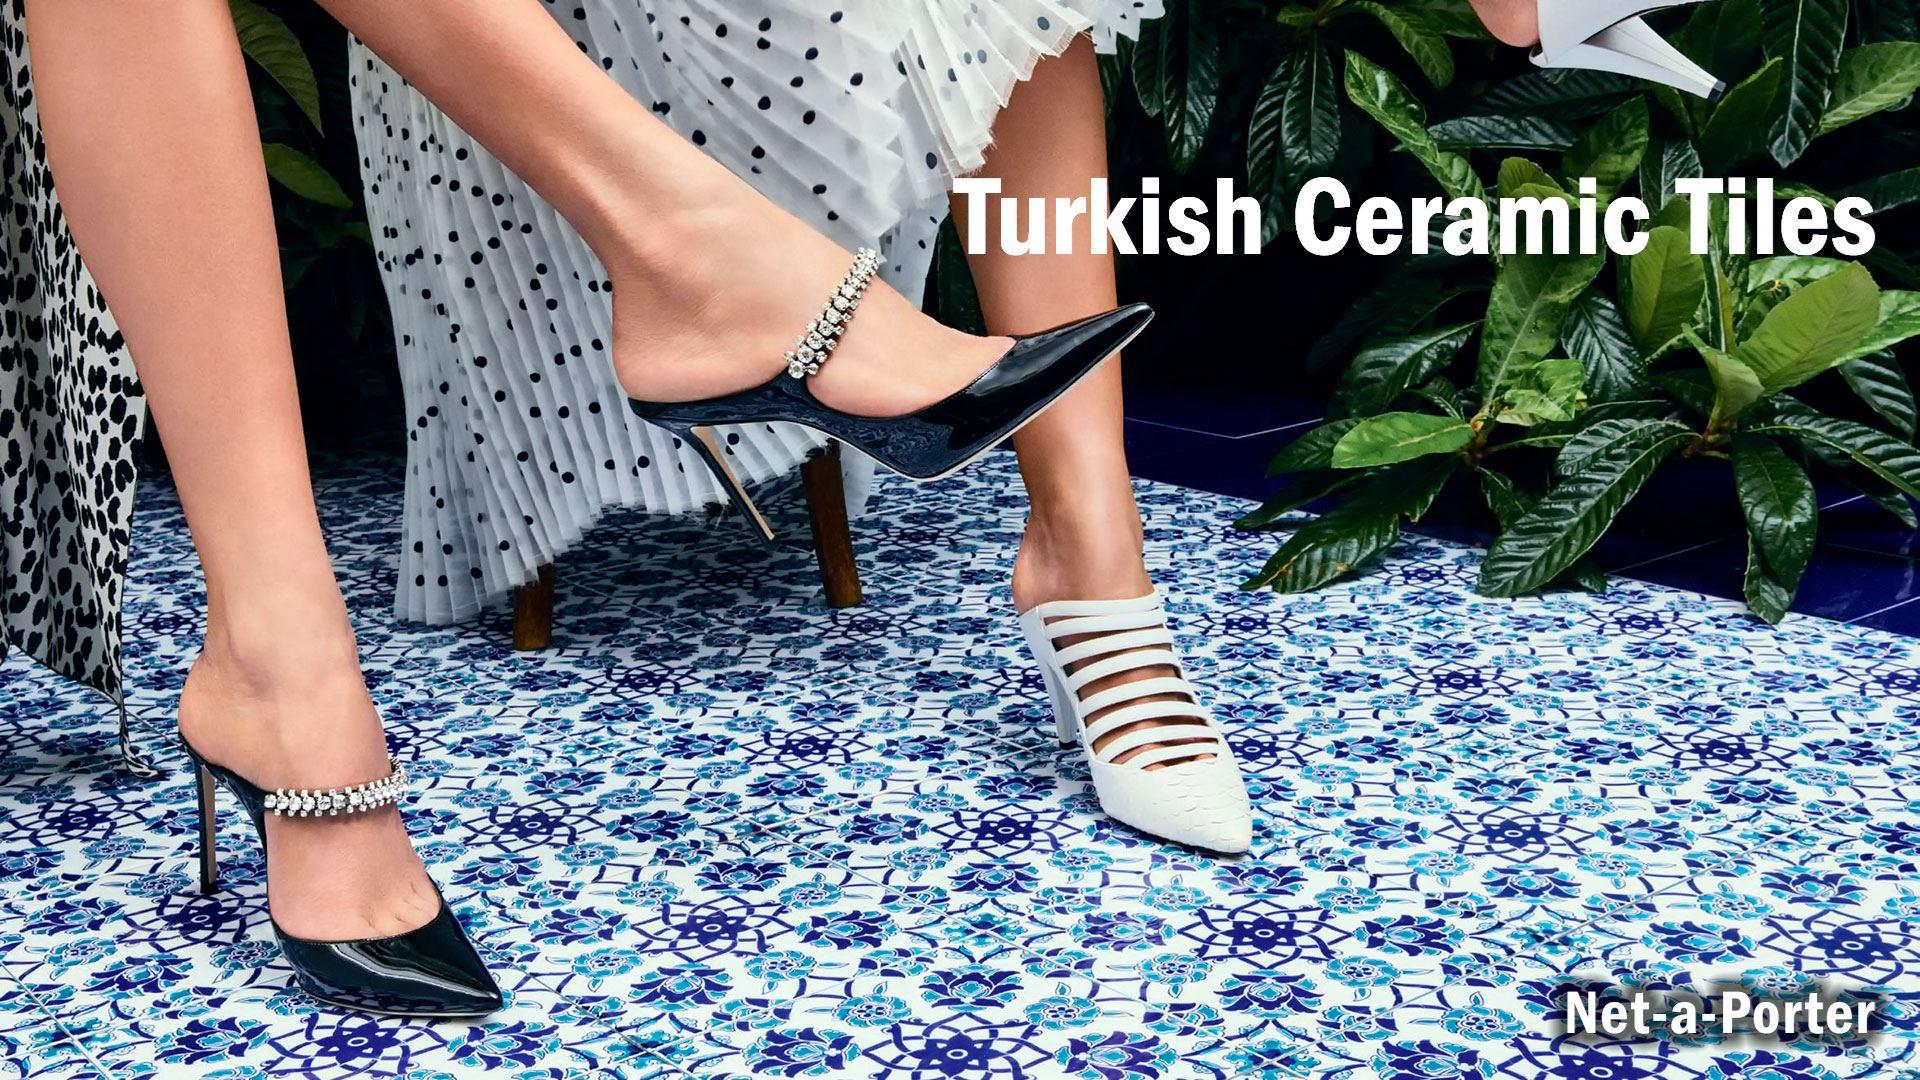 Turkish Tiles at Net-a-Porter - Turkish Ceramic Tiles